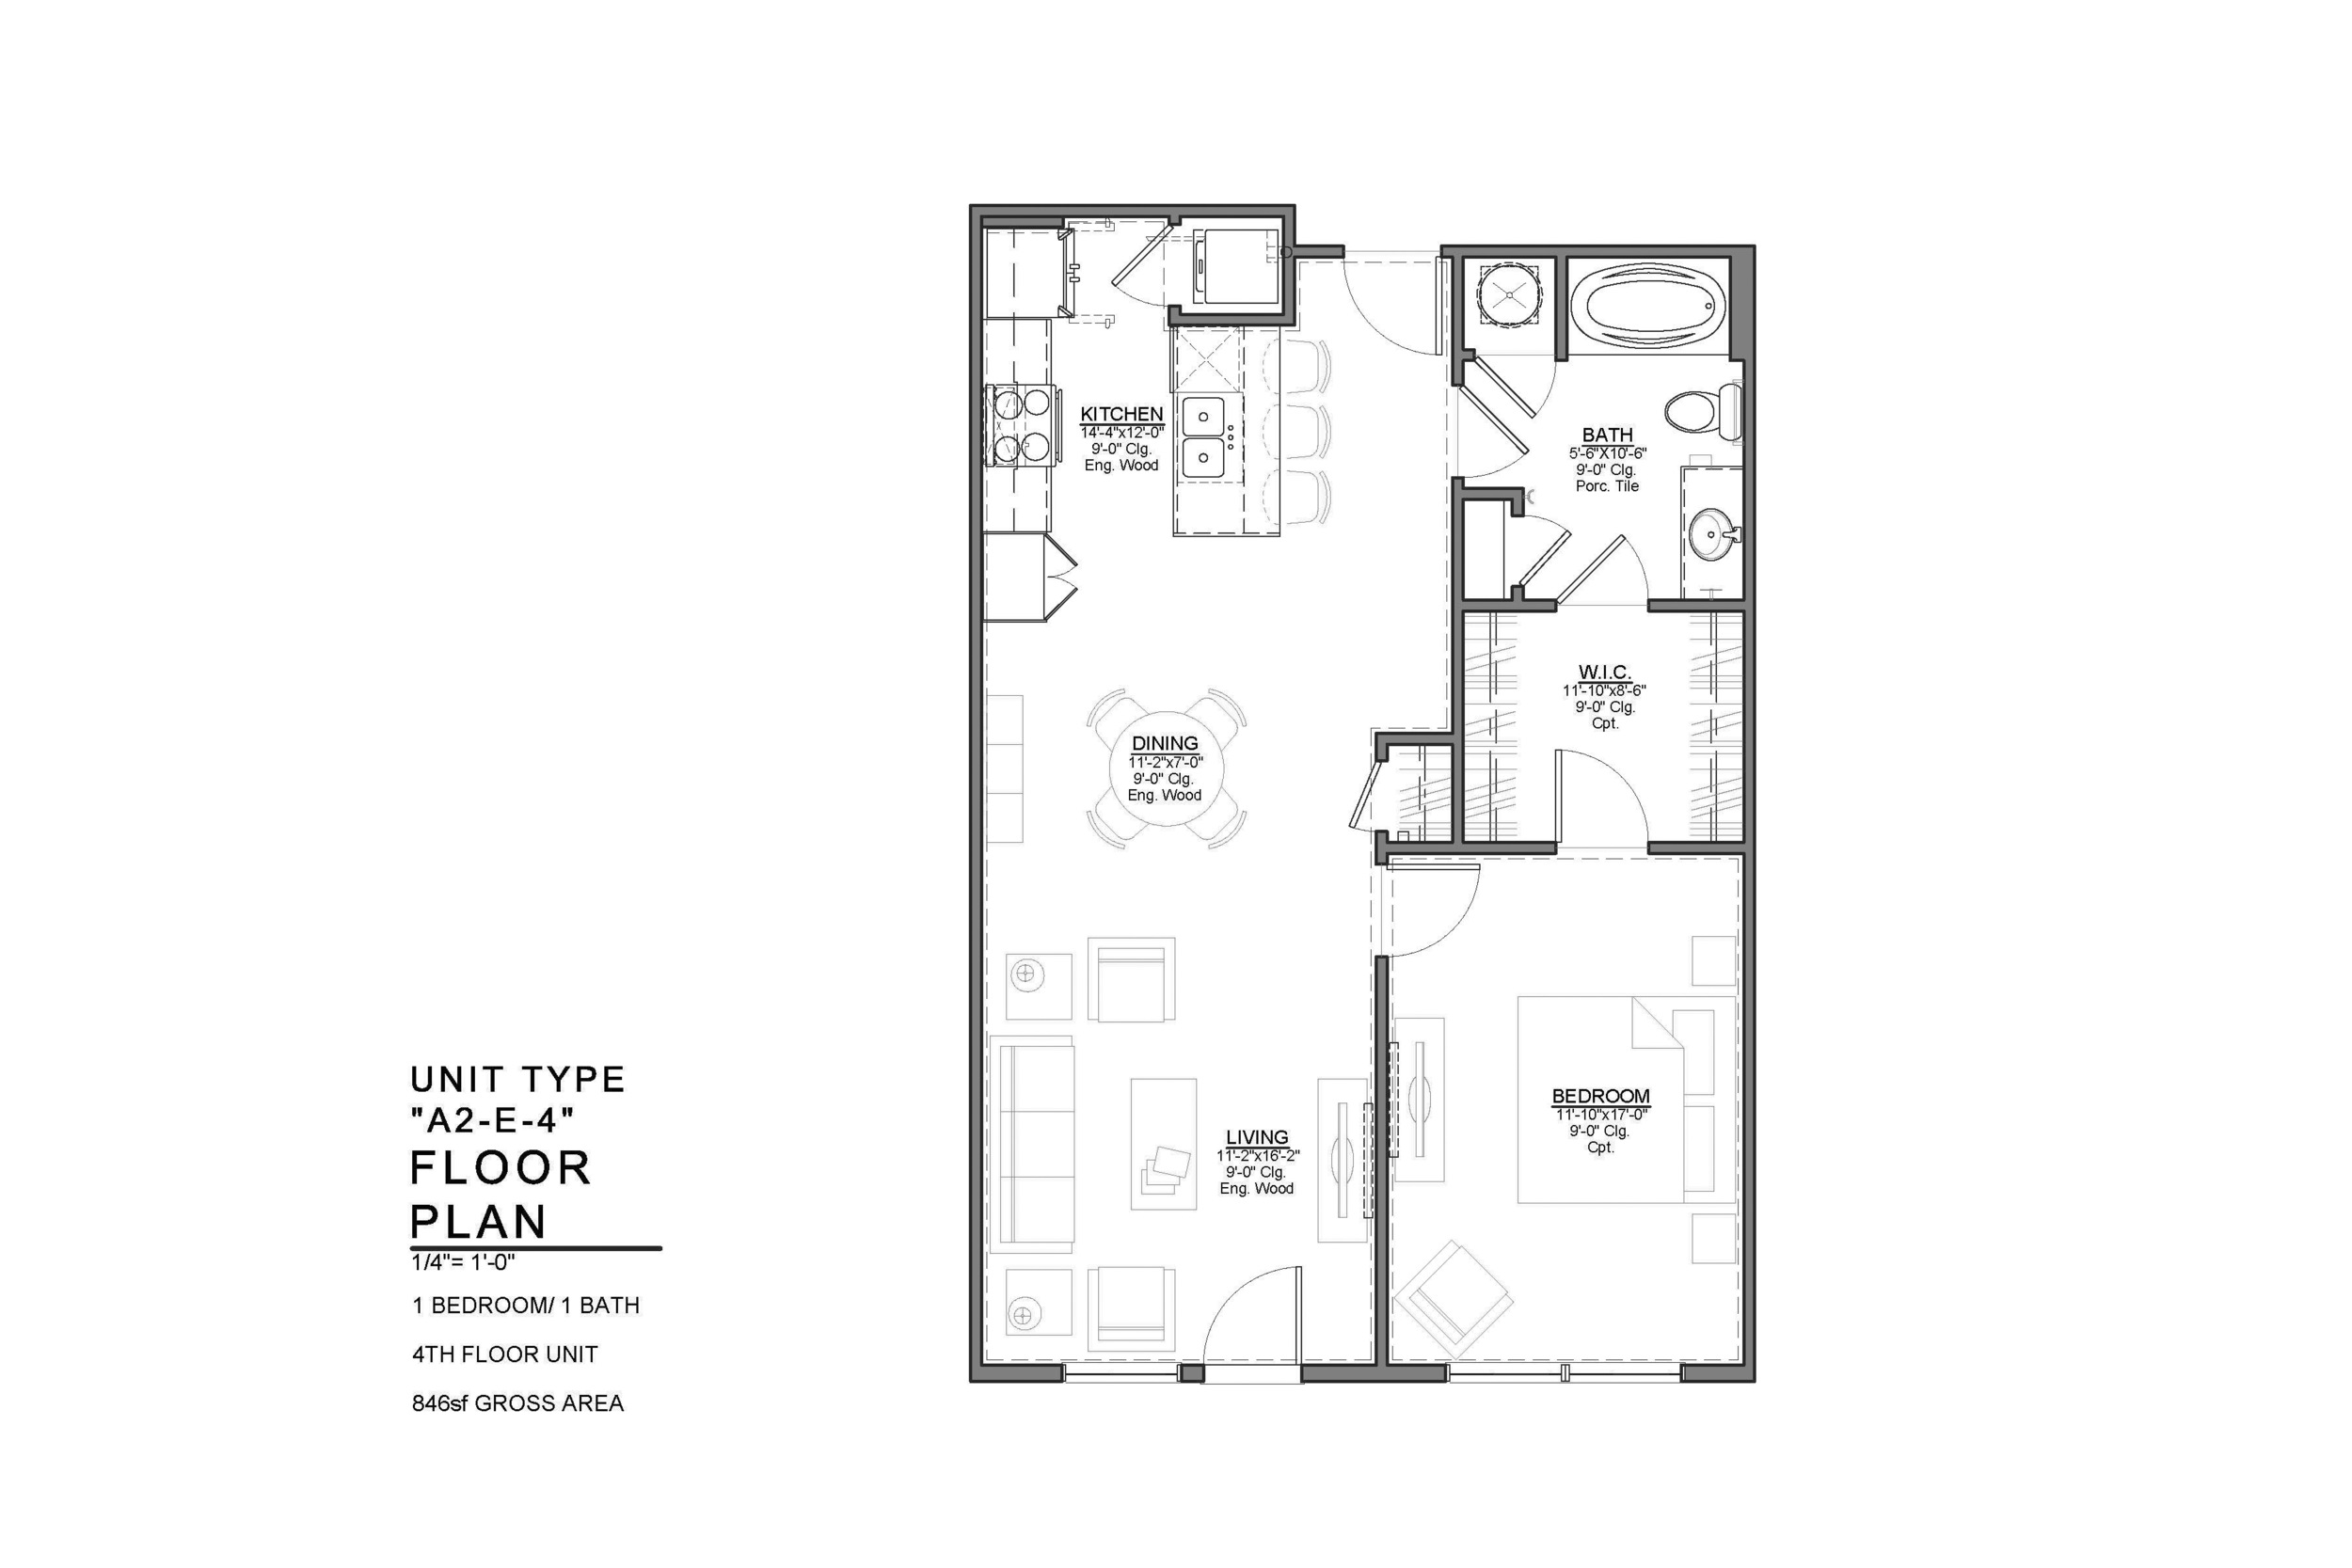 A2-E-4 FLOOR PLAN: 1 BEDROOM / 1 BATH